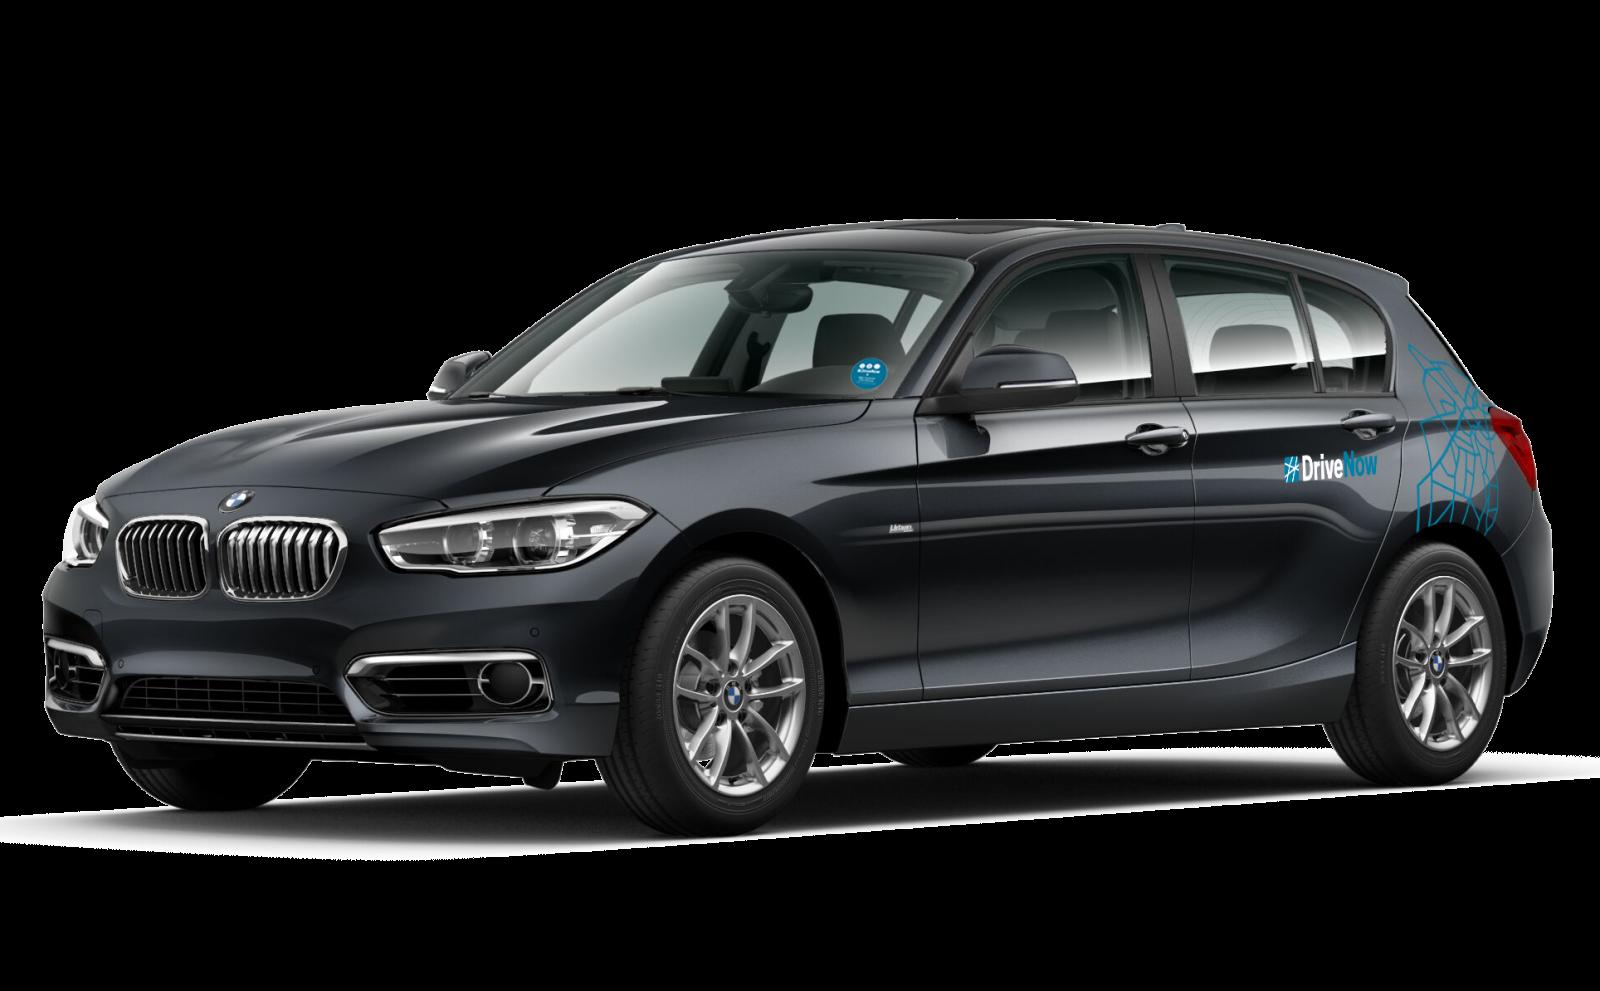 DriveNow_BMW_1SeriesLCI_Silhouette_Transvers_MineralGrey (2)